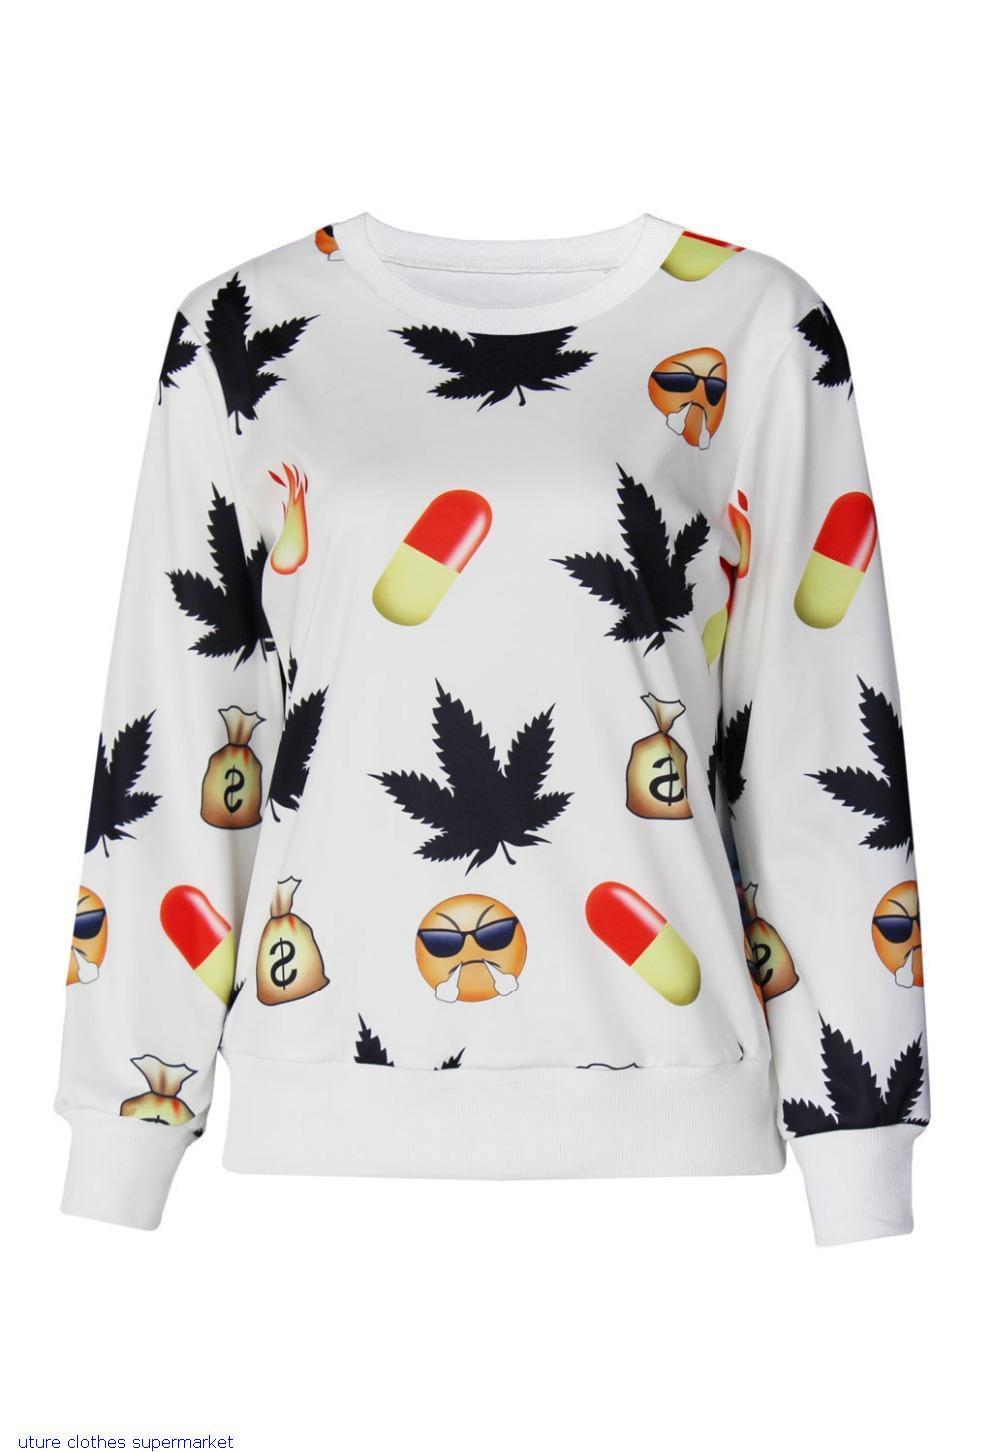 New Printed Sweatshirt Hoodies Emoji Women Pullover Women In Emoji Print Jogging Sweatshirt LC25351 Casual Suit Track SuitsОдежда и ак�е��уары<br><br><br>Aliexpress